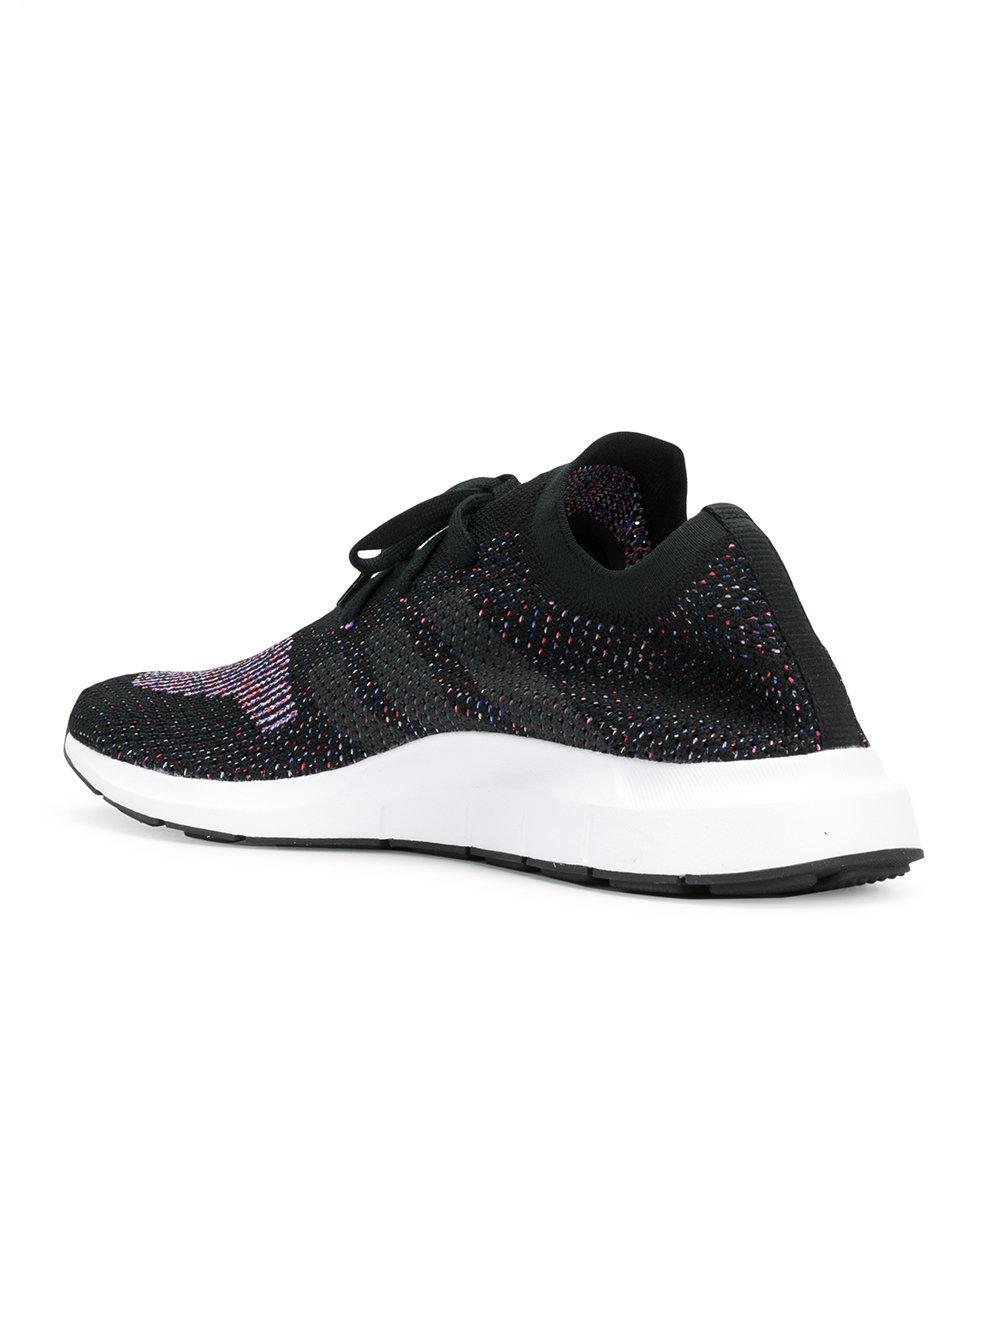 Adidas Originals Swift Run Primeknit Sneakers